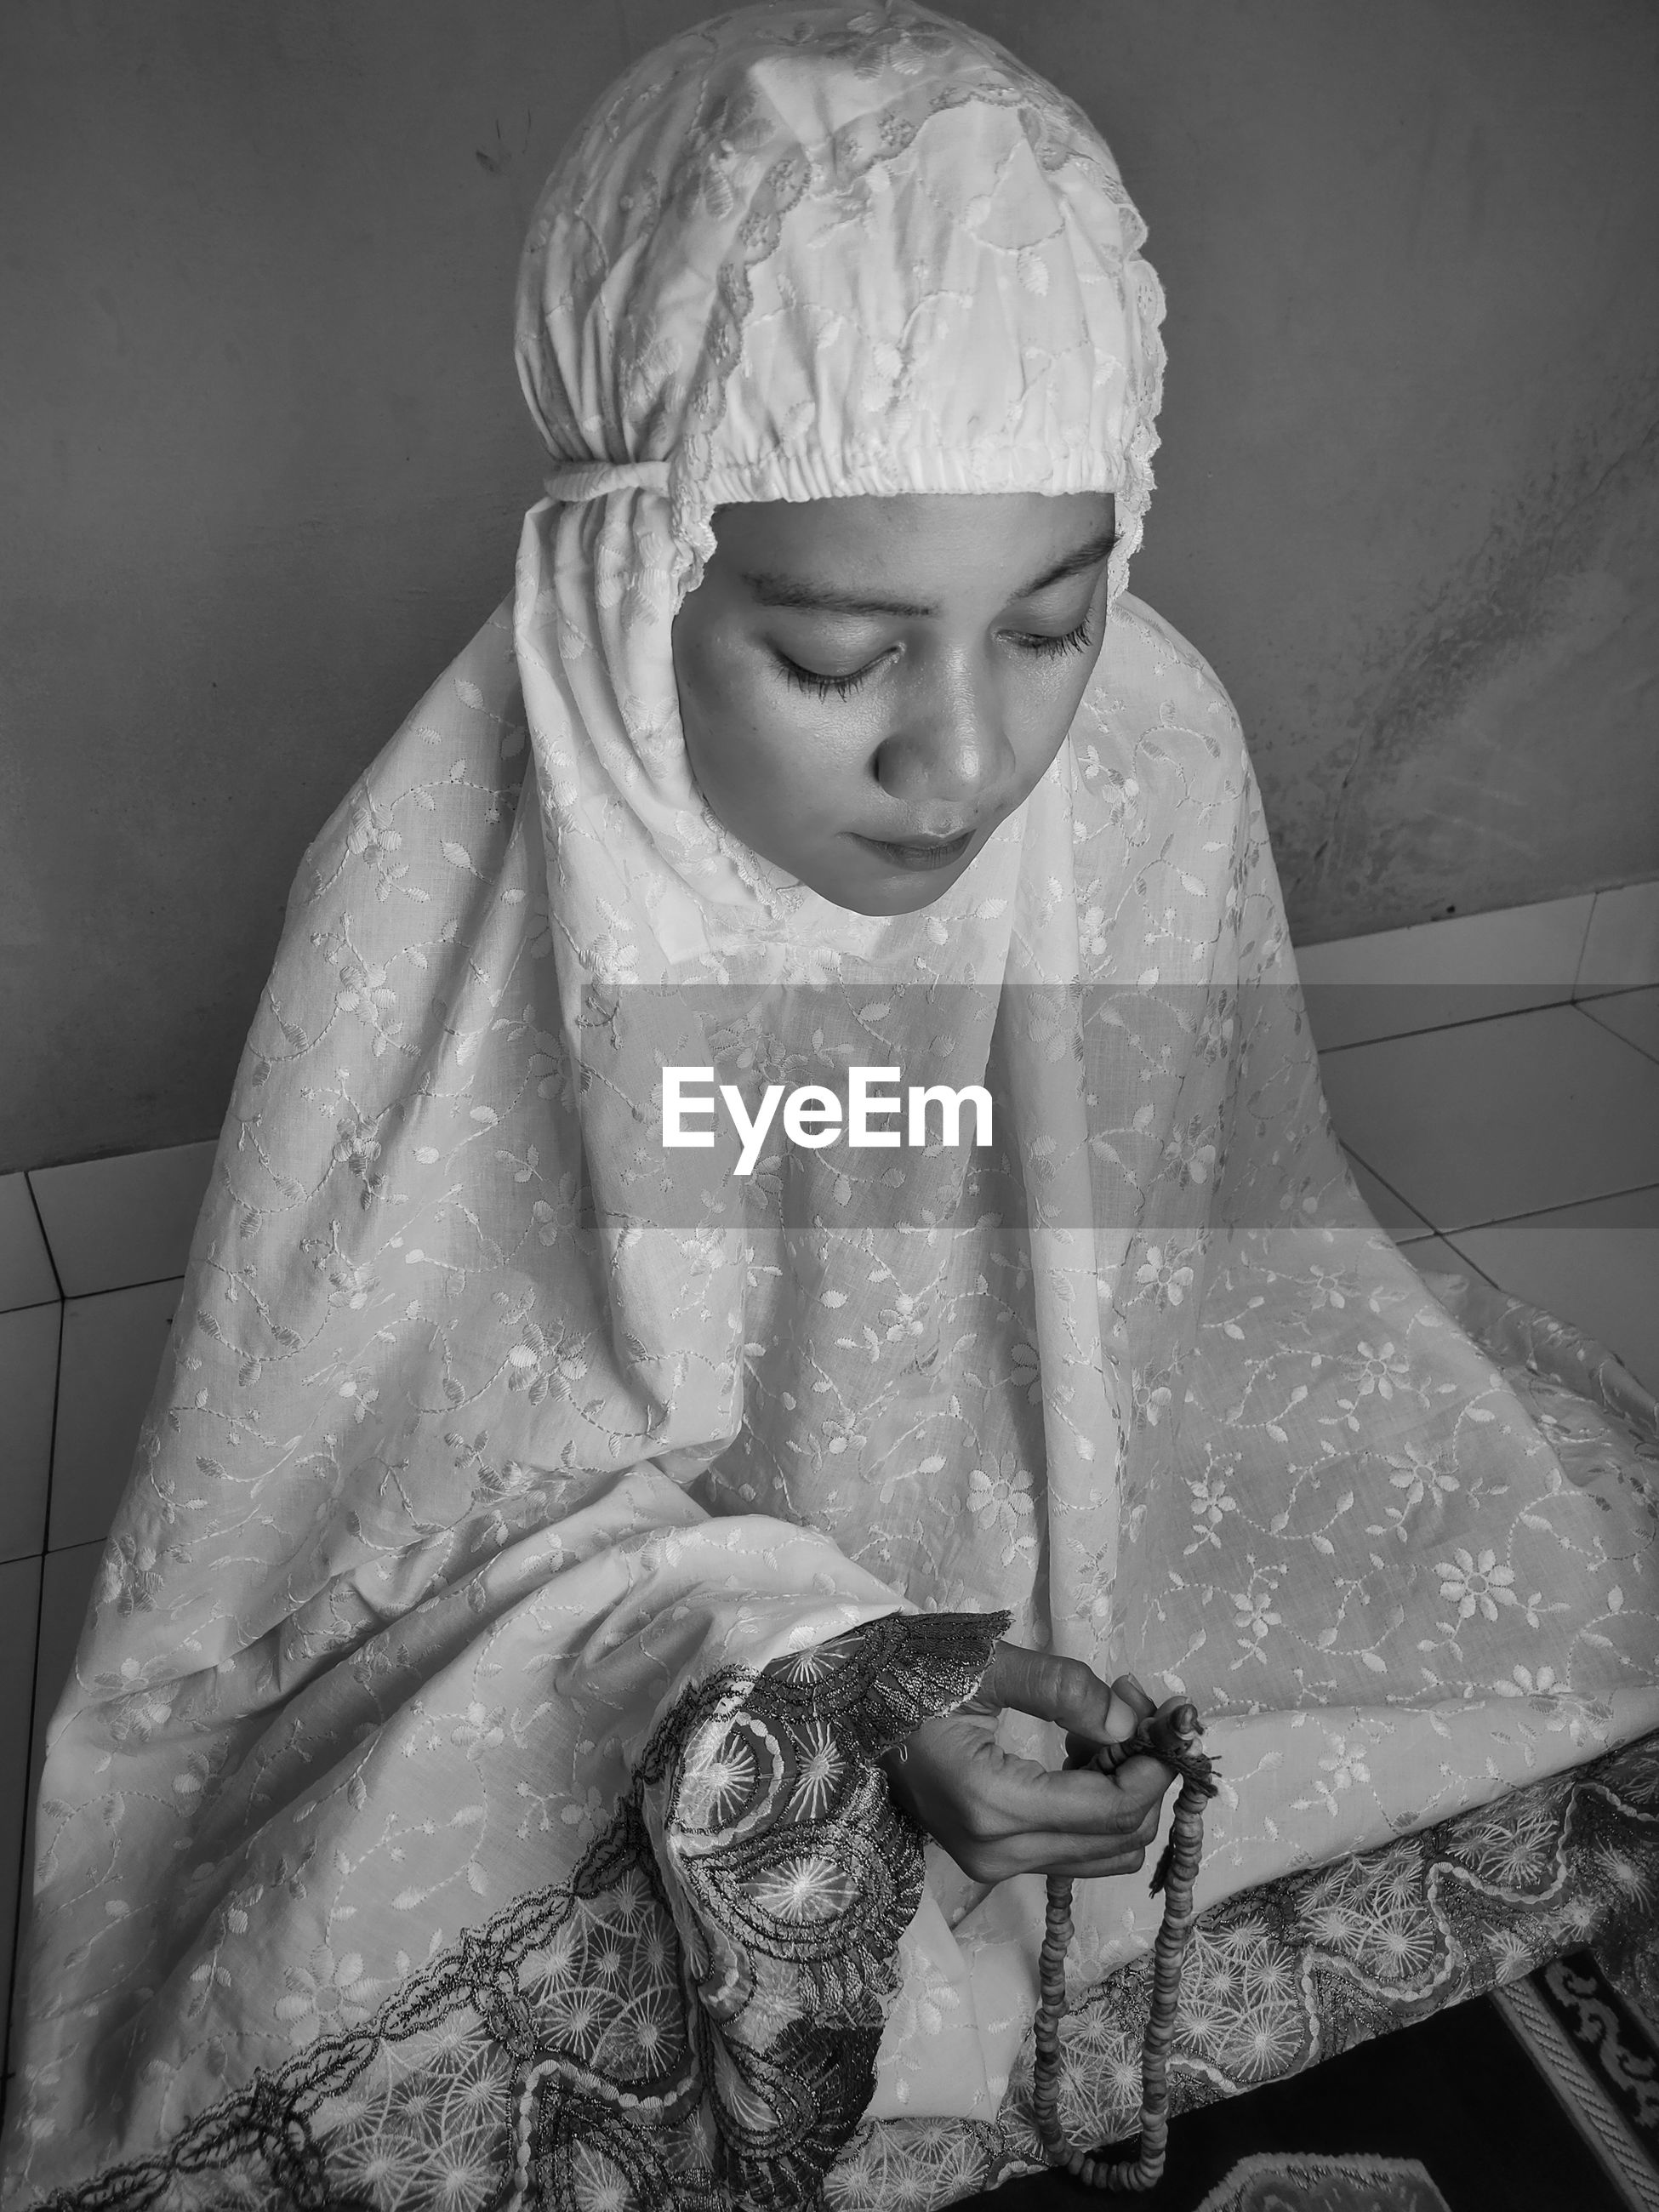 Muslim woman pray at home because corona virus